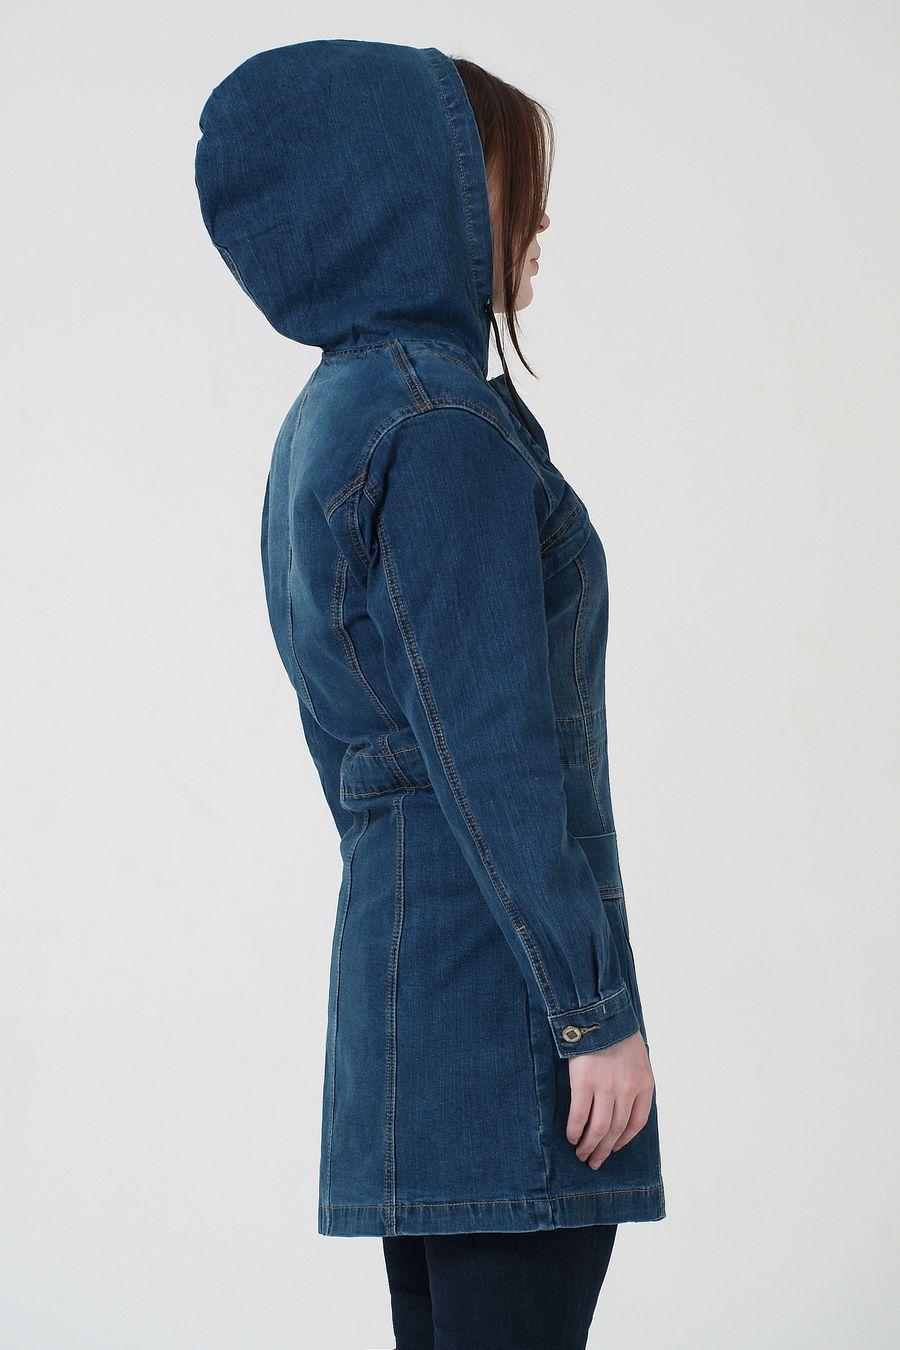 Куртка женская K.Y Jeans 901 утепленная - фото 3